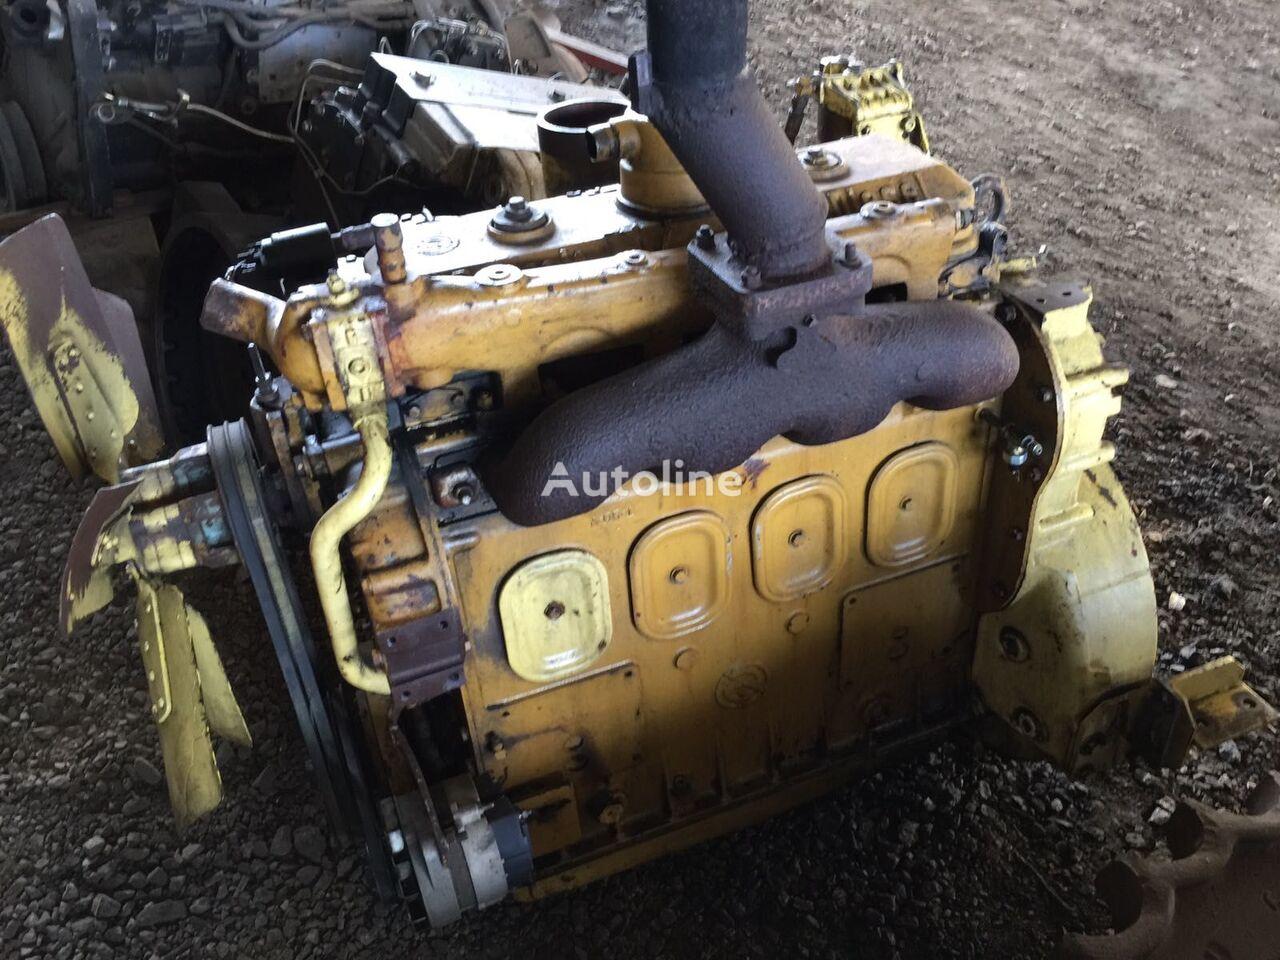 USED DETROIT DIESEL 4-71 GENERAL 4-71 NON TURBO engine for 4-71 grader